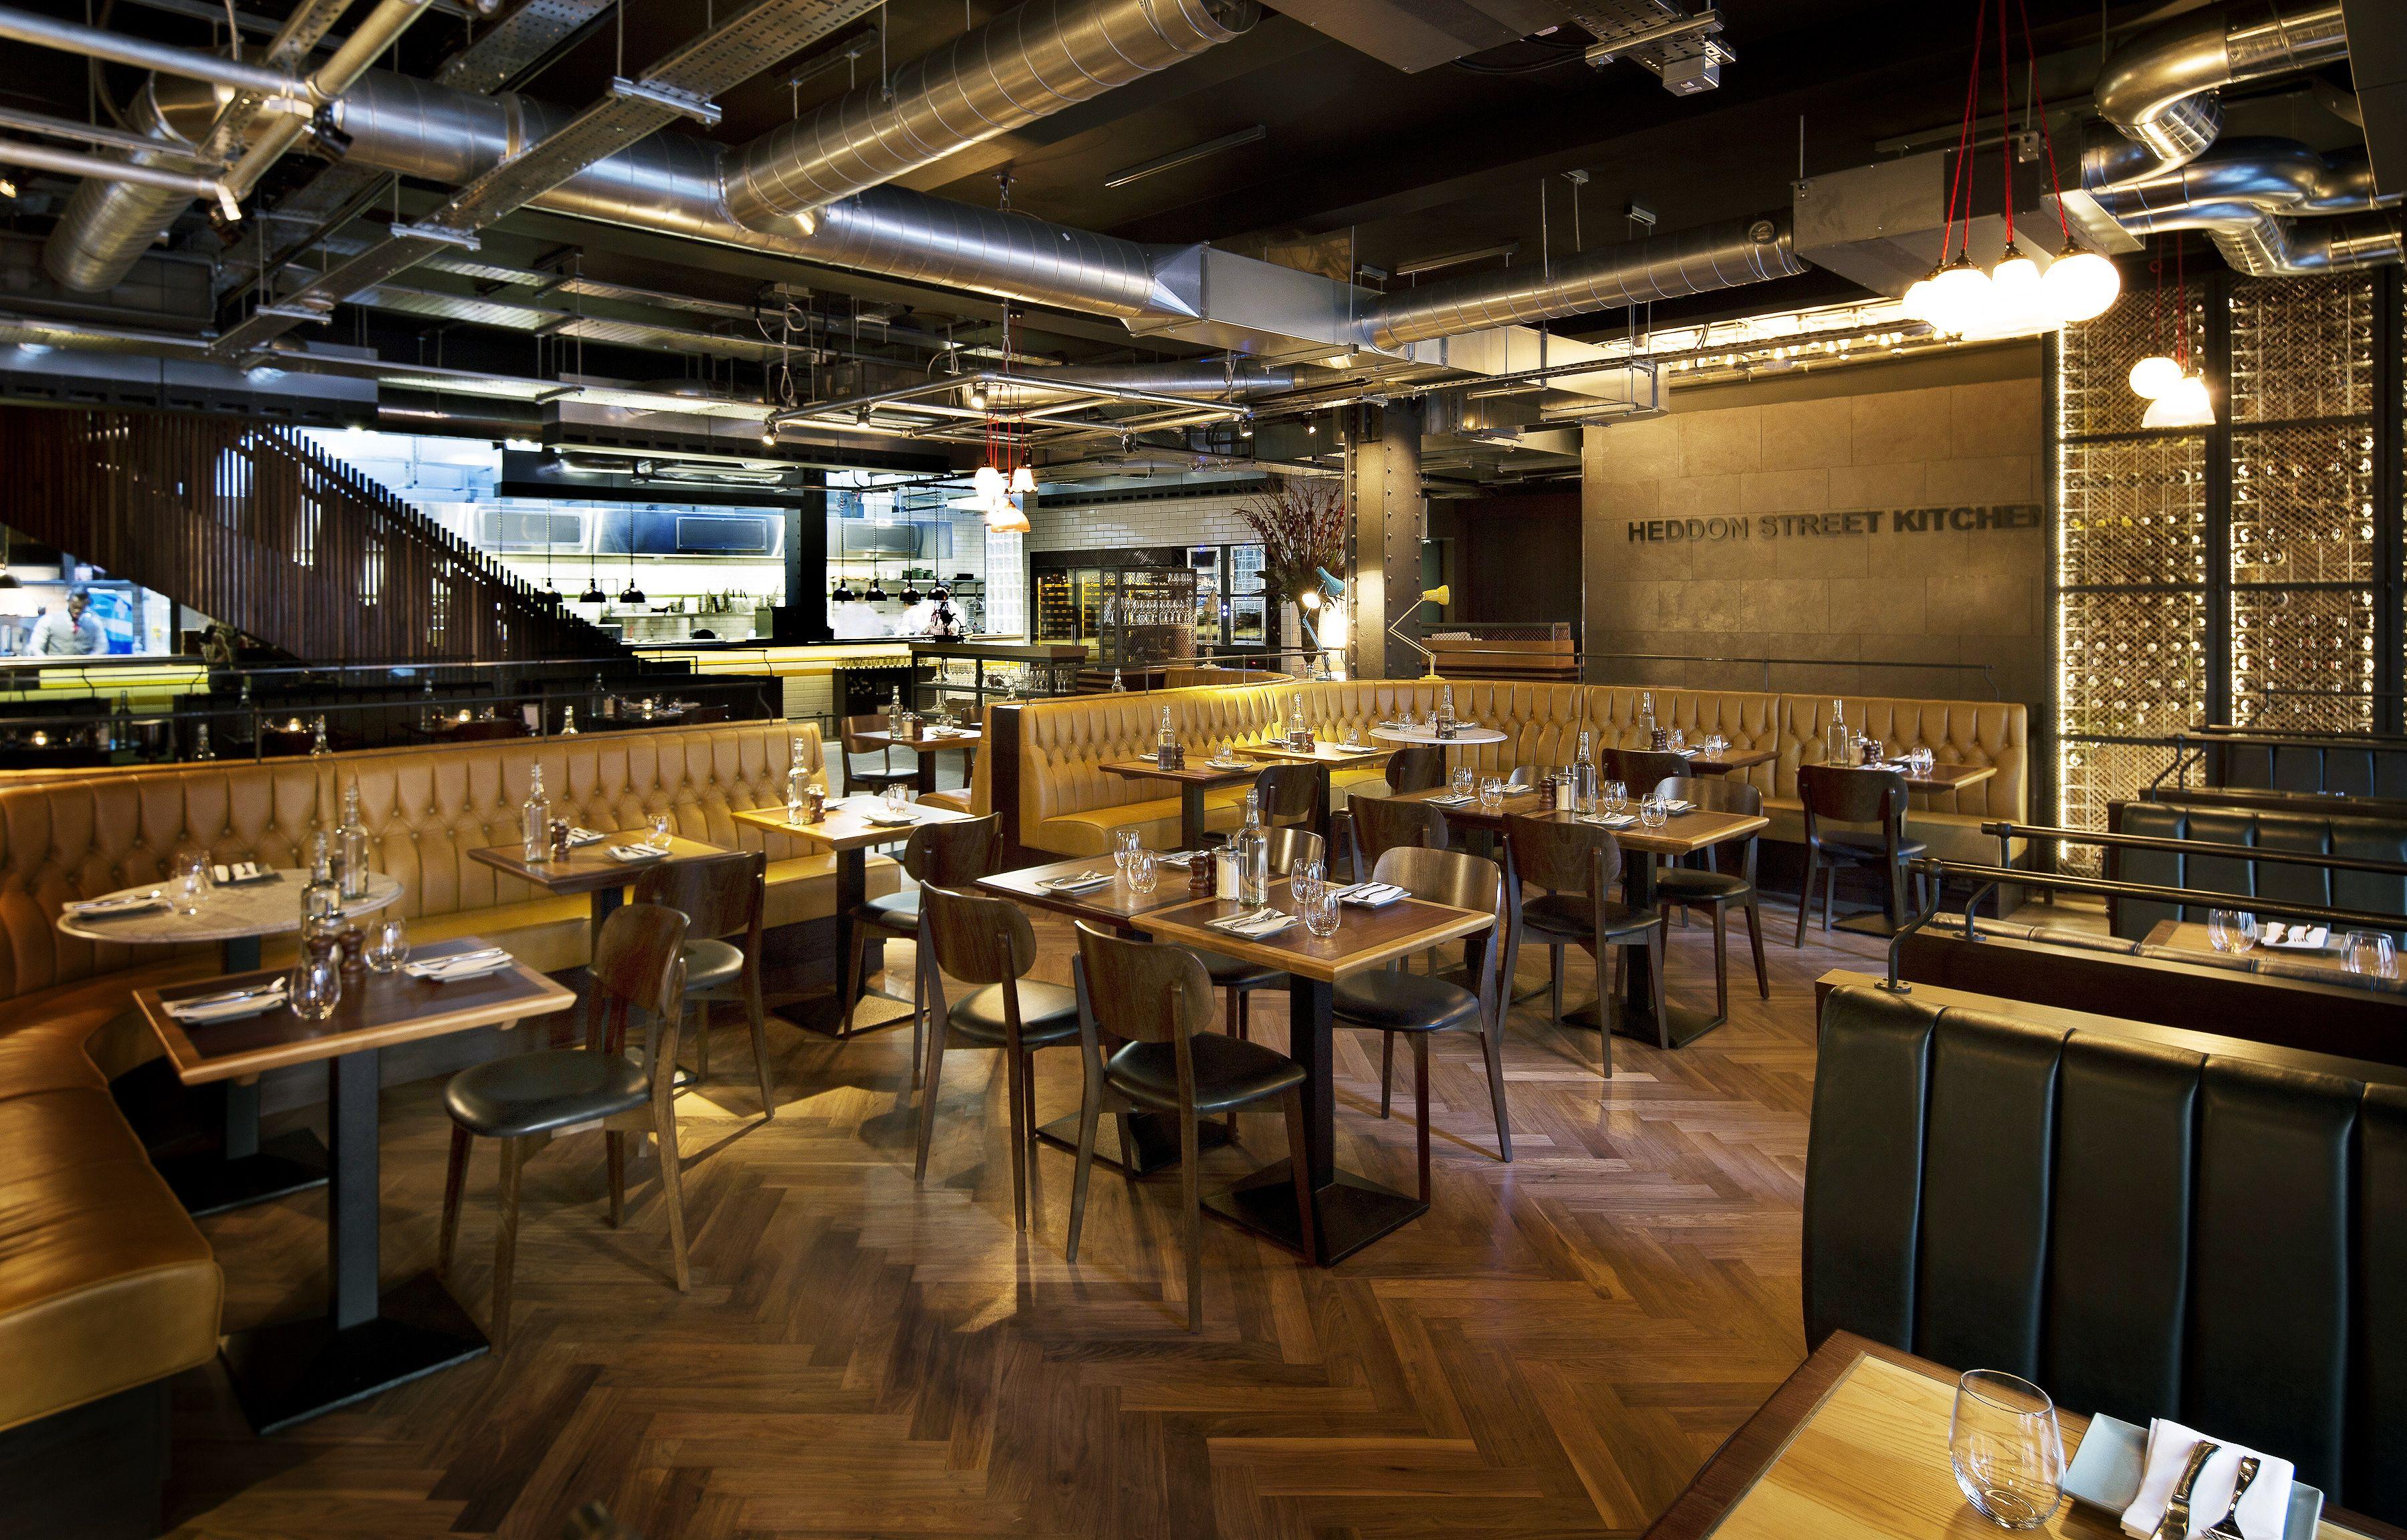 Heddon street kitchen gordon ramsay restaurants london